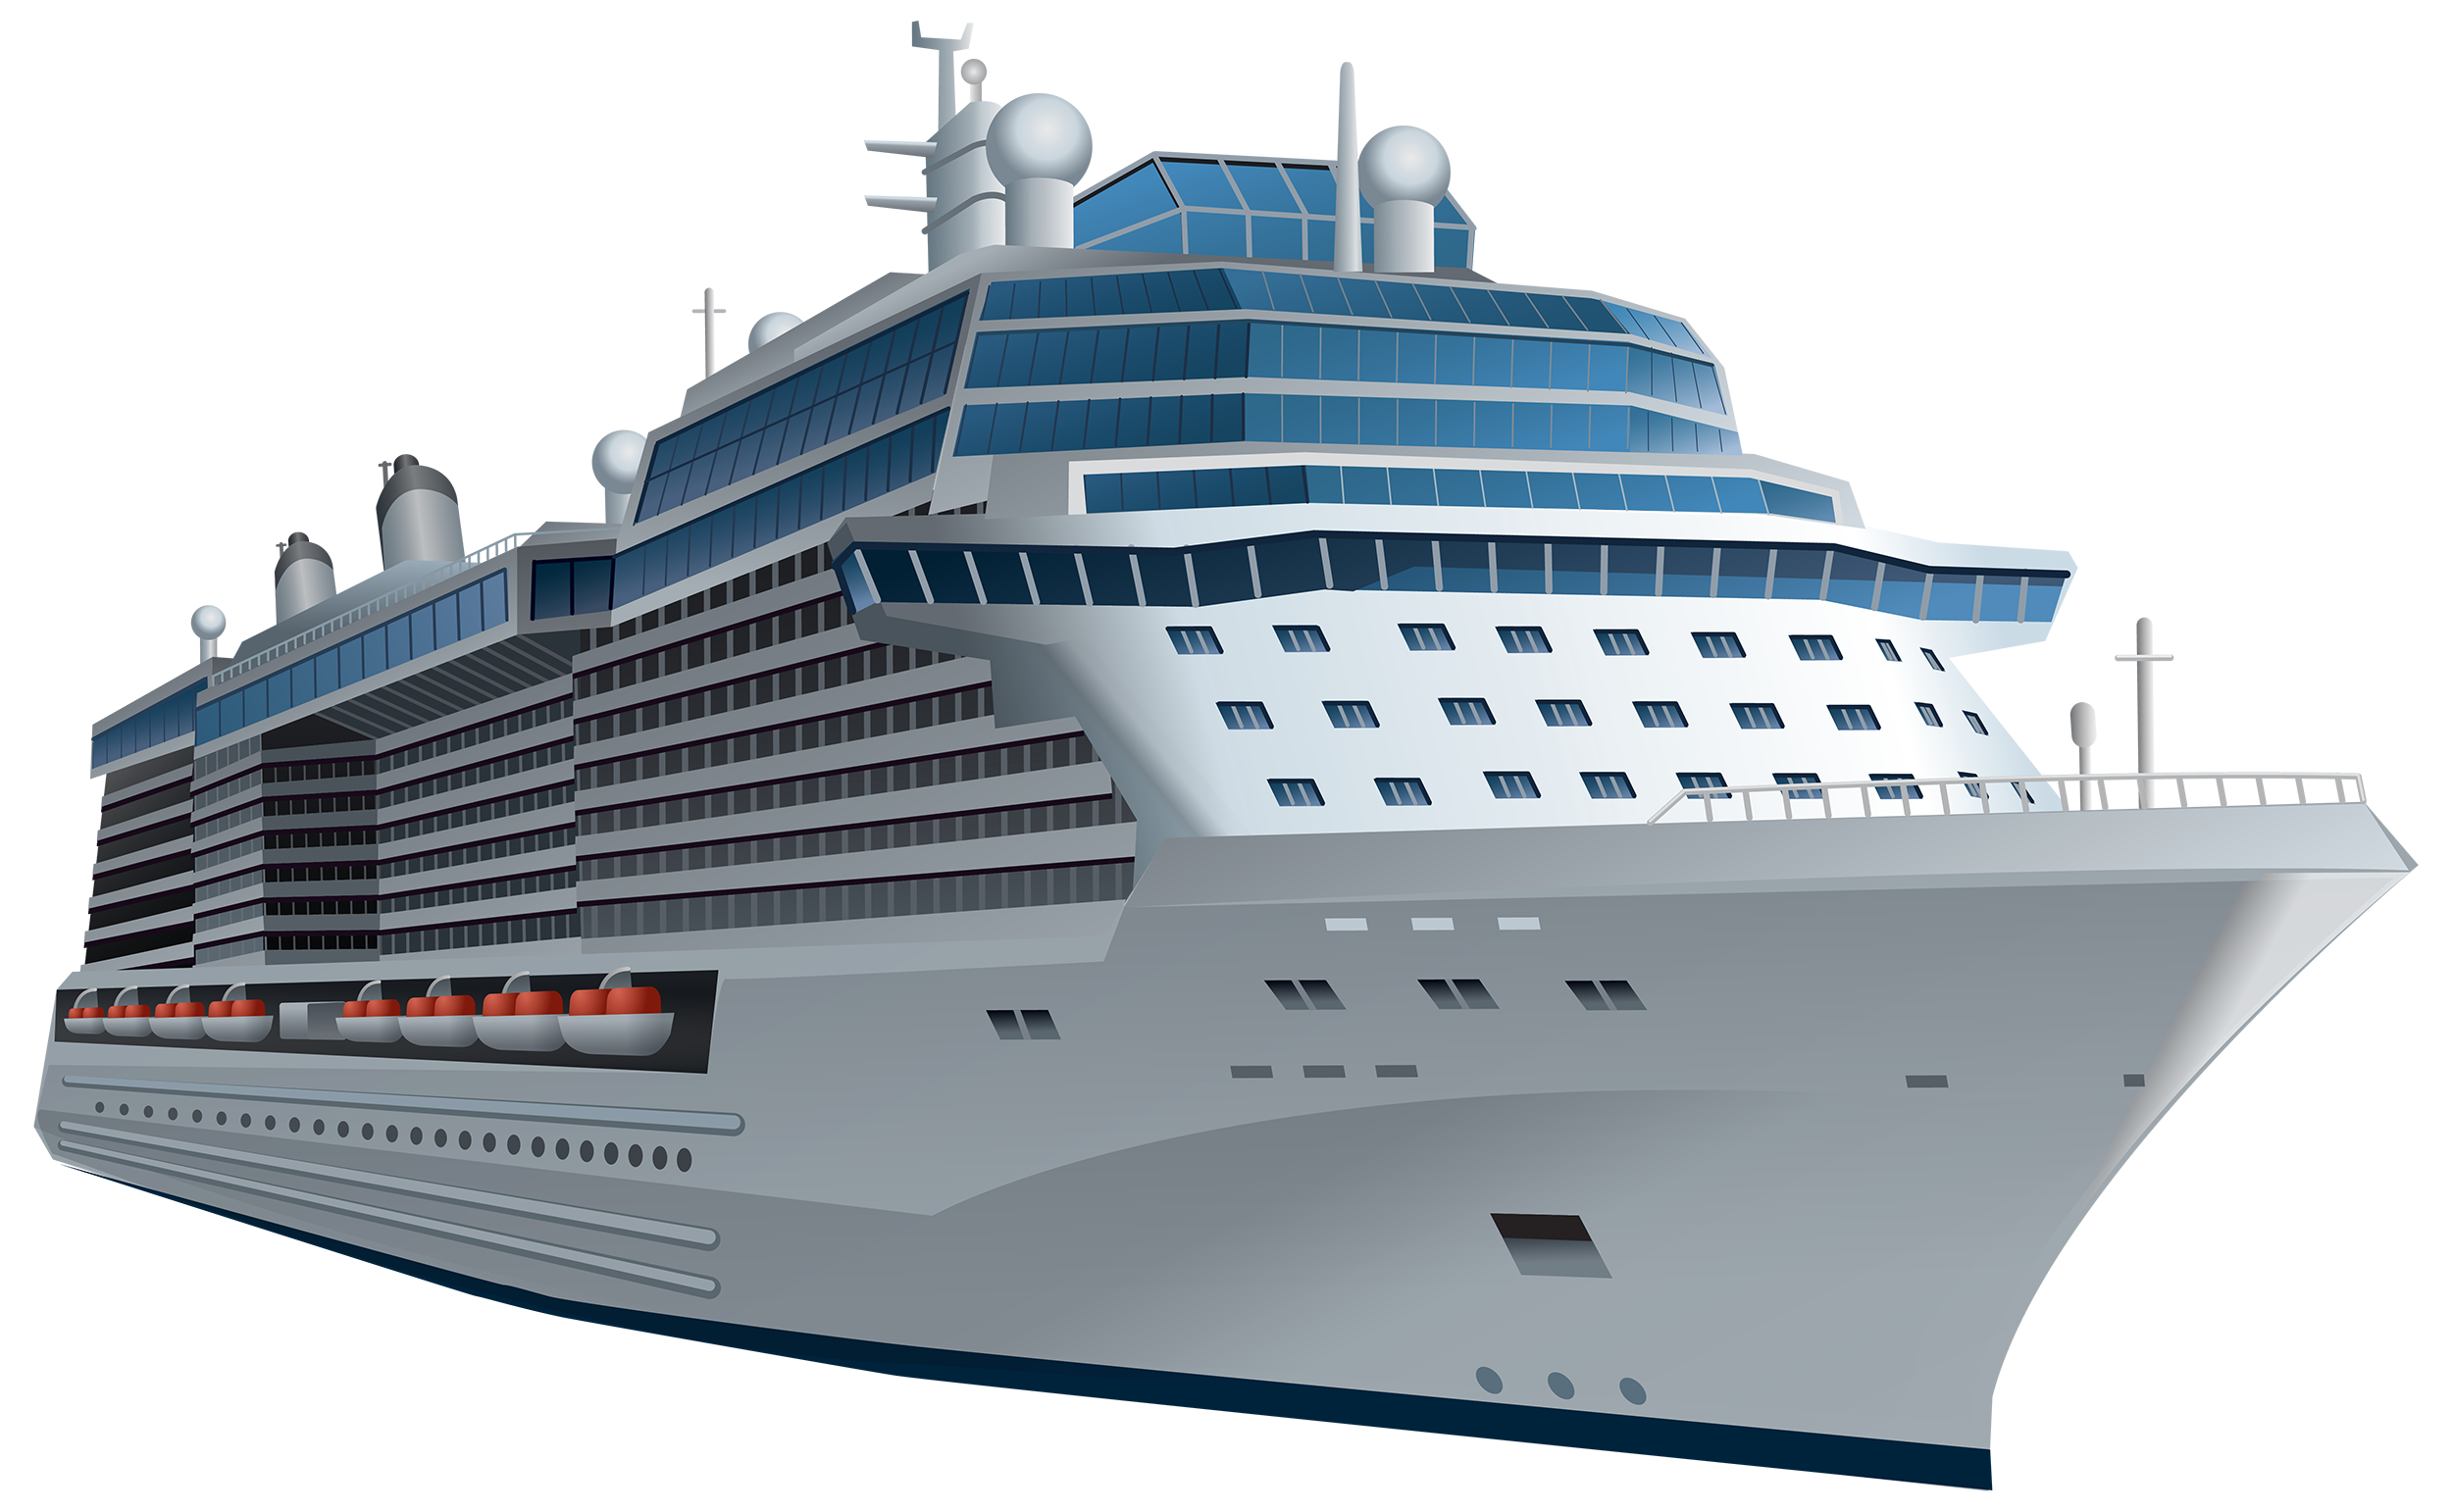 Ship PNG - 9485